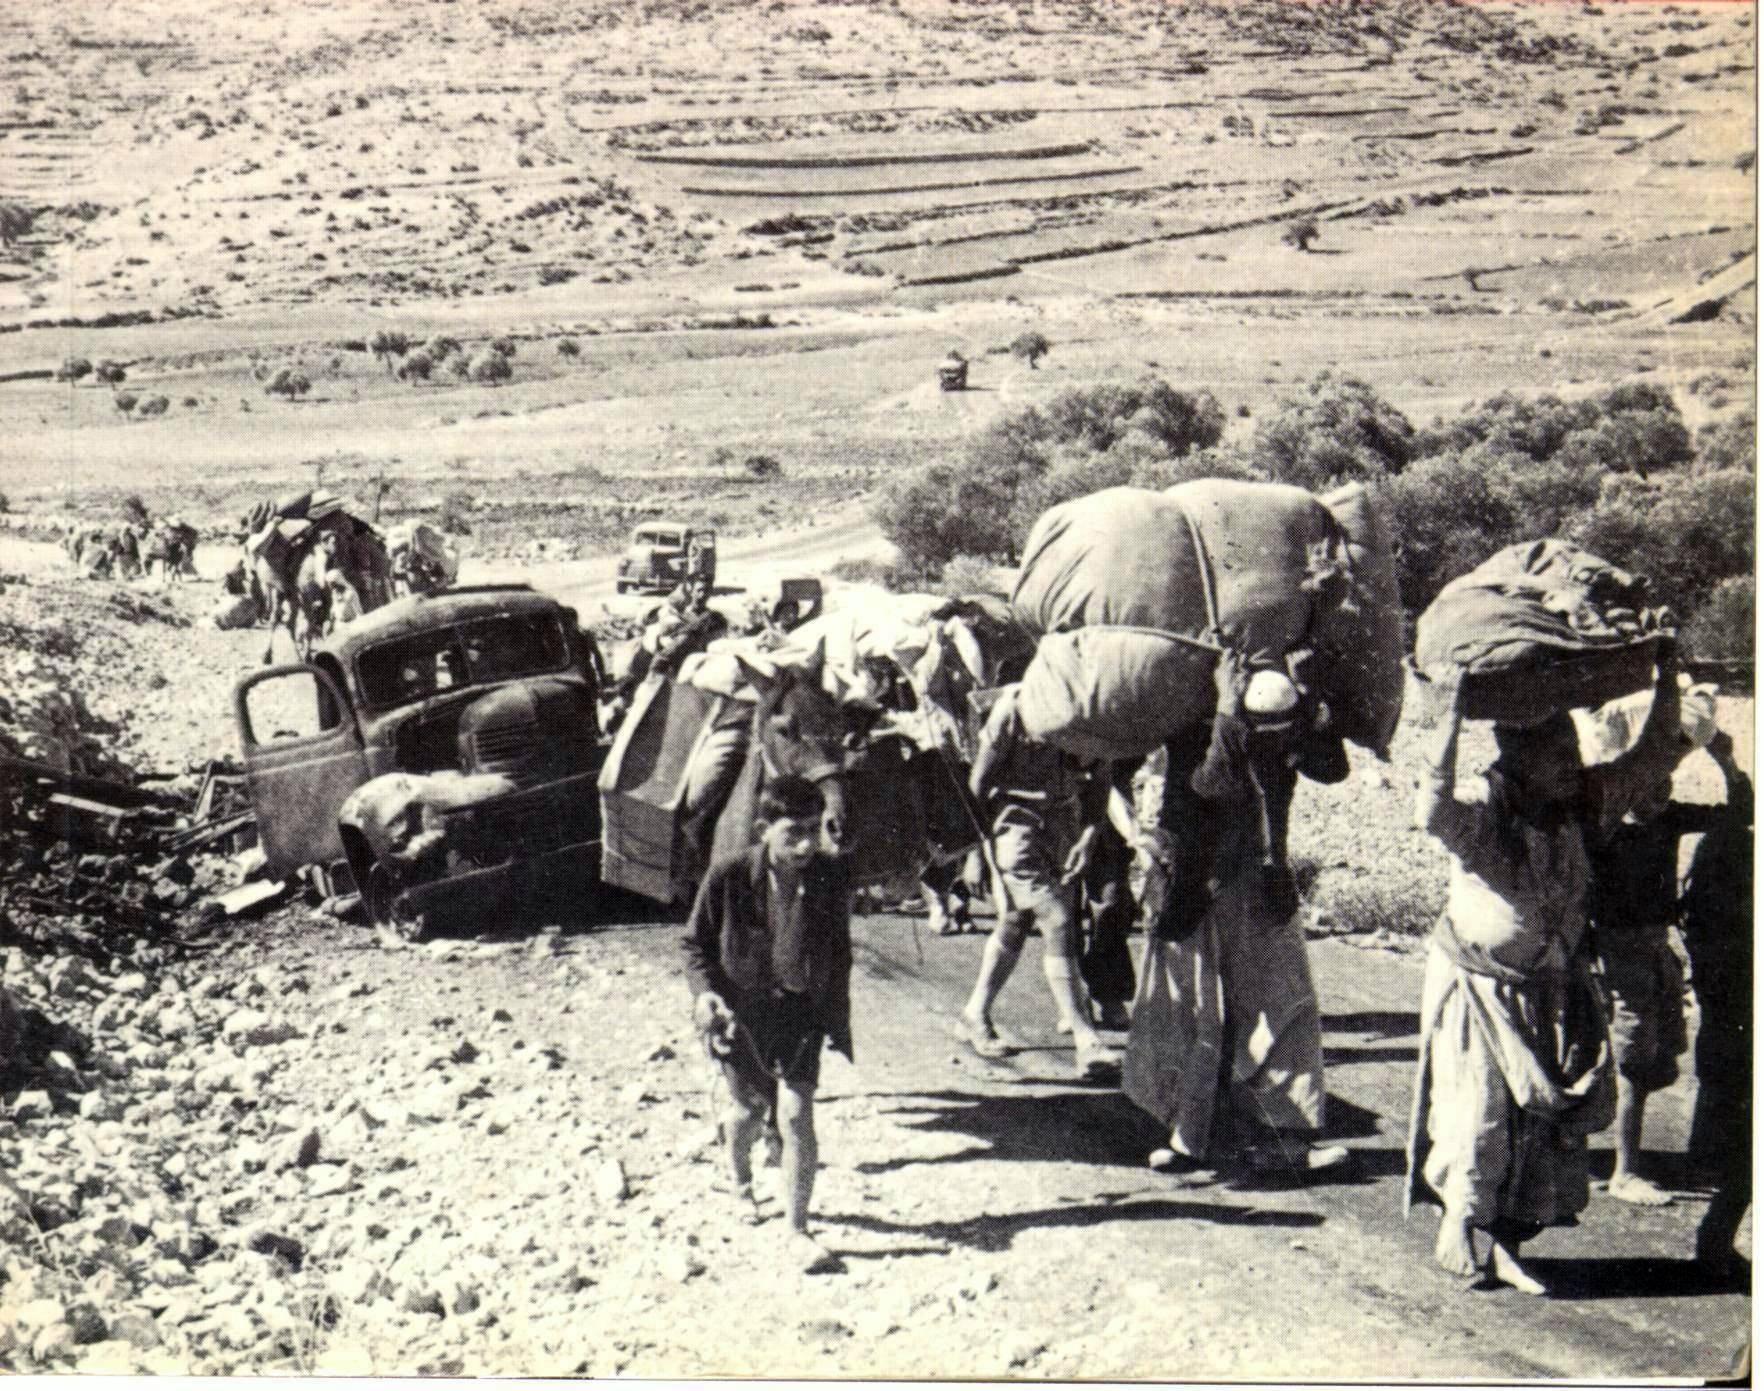 Palestinian refugees, 1948